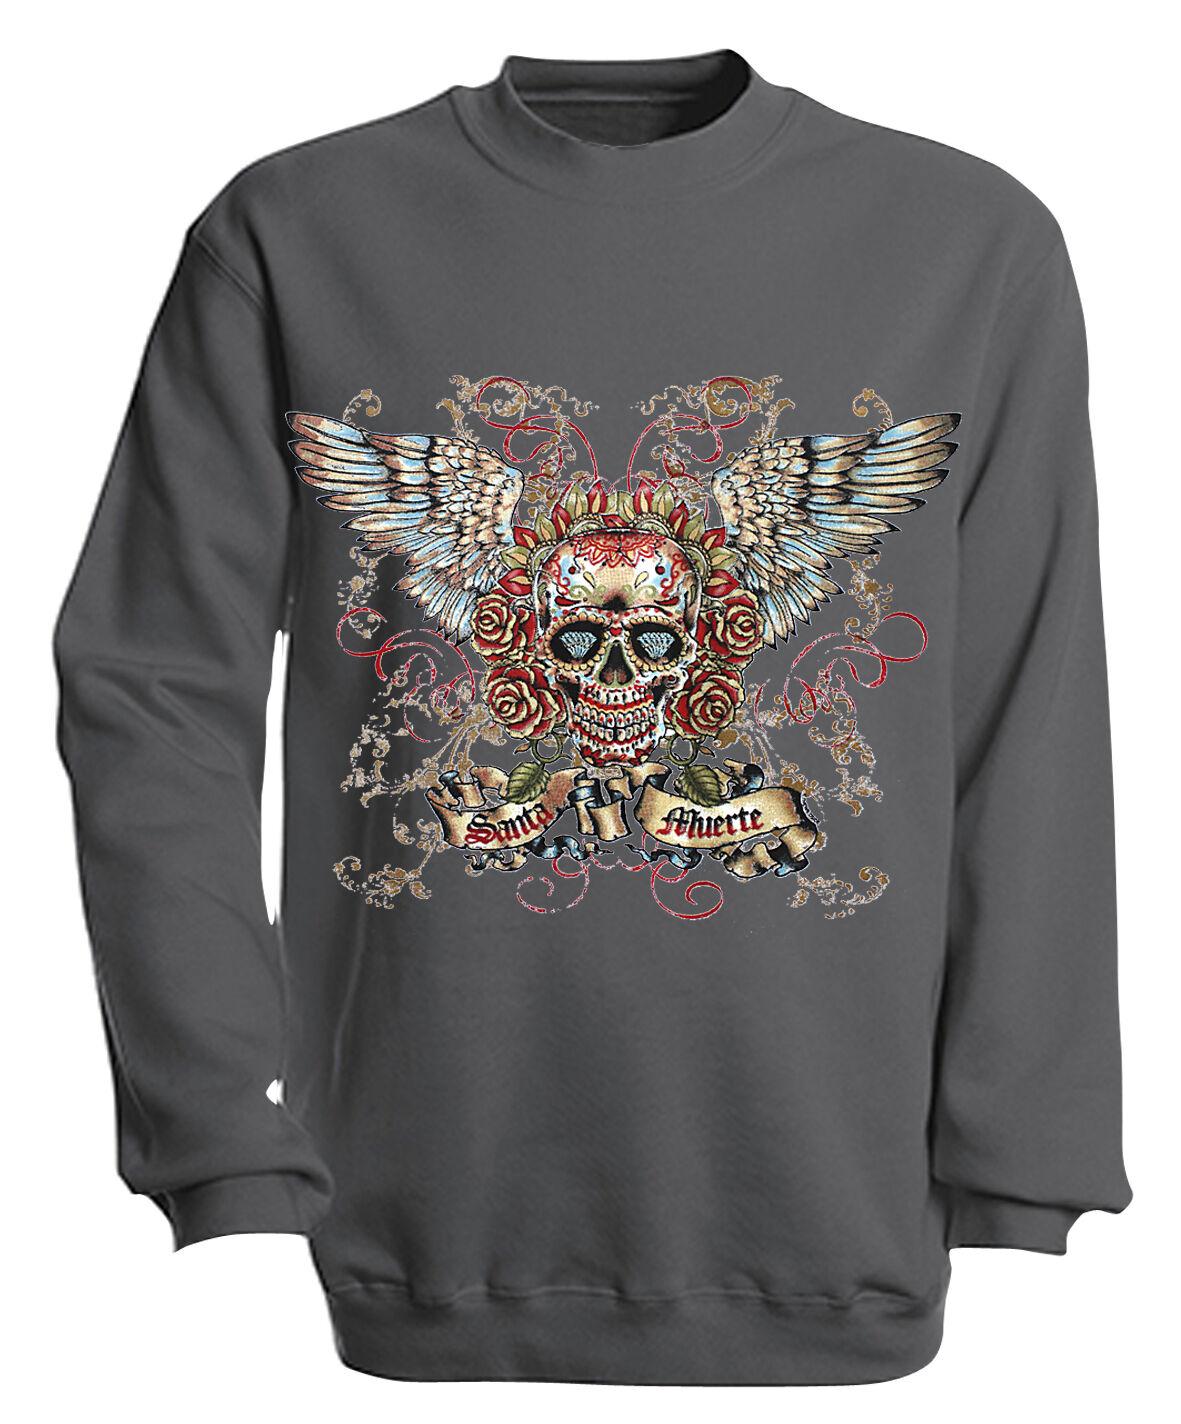 (10282-1 grau) Sweatshirt Sweater S M L XL XXL 3XL 3XL 3XL 4XL - Totenkopf SANTA MUERTE  | Attraktiv Und Langlebig  |  Neuer Markt  | Ab dem neuesten Modell  8e3b87